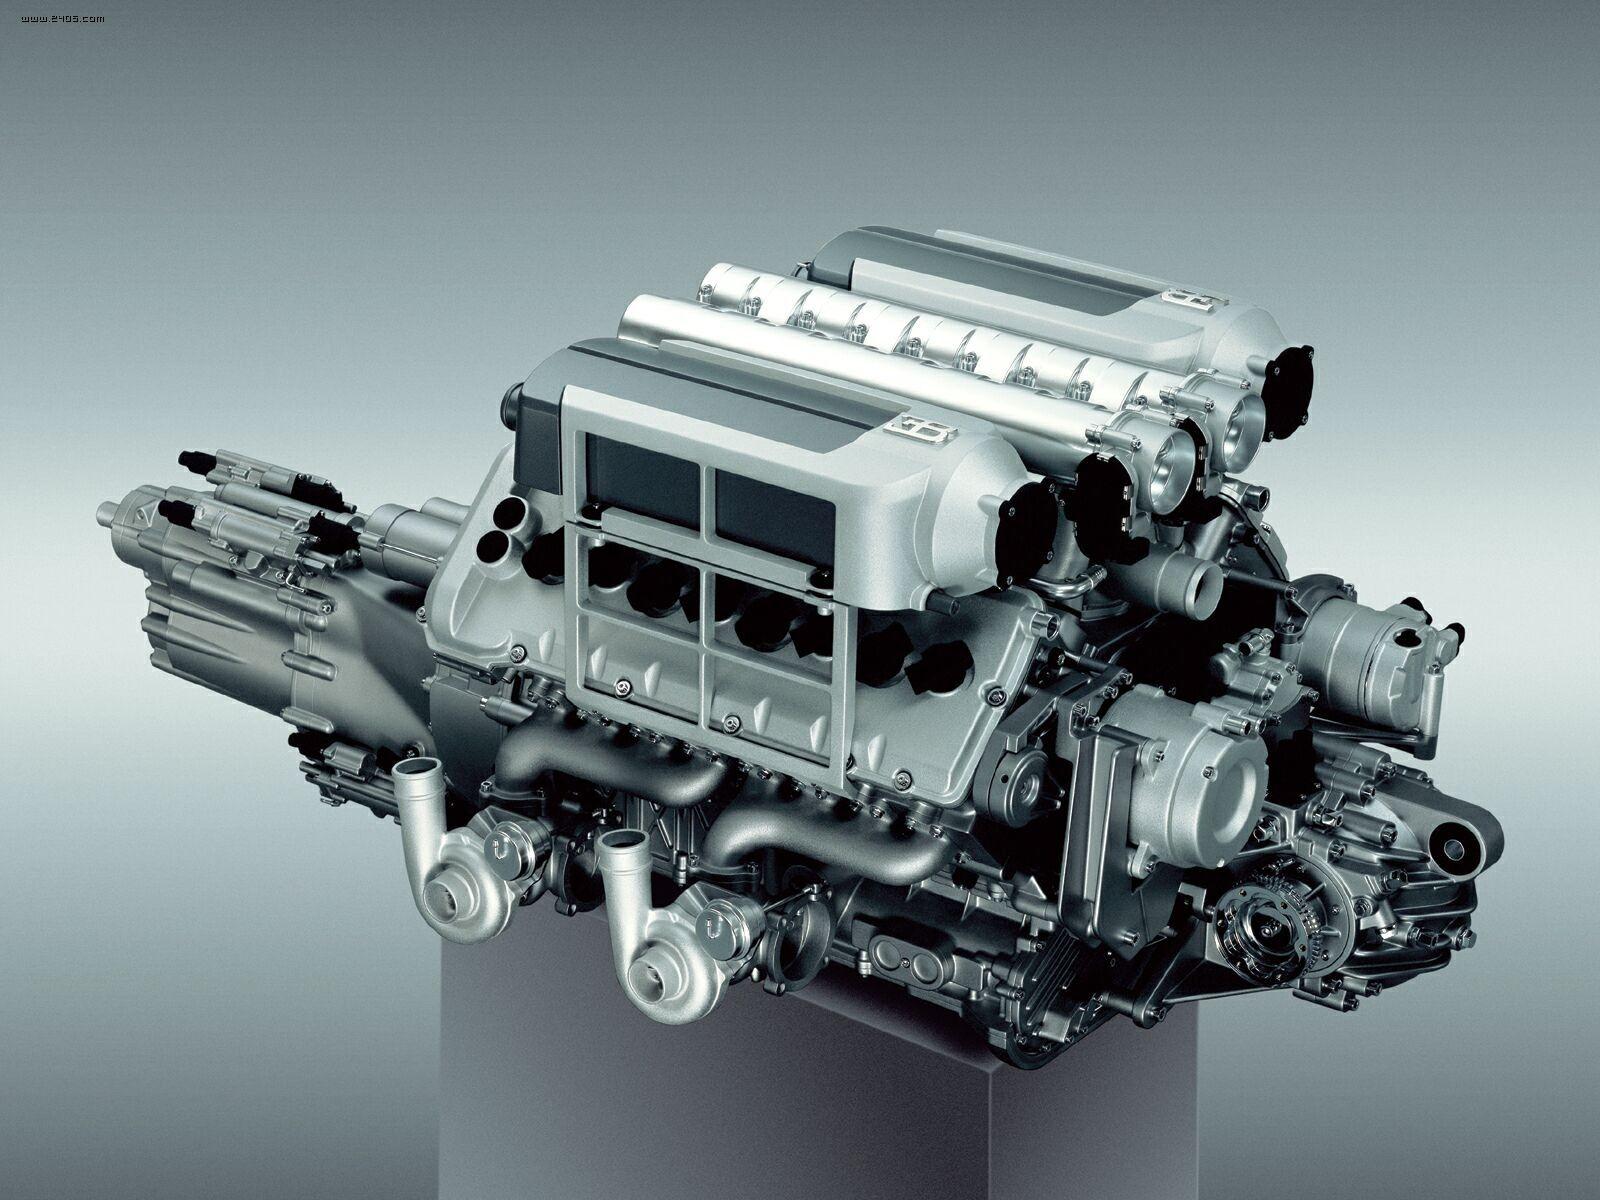 bugatti veyron engine [ 1600 x 1200 Pixel ]